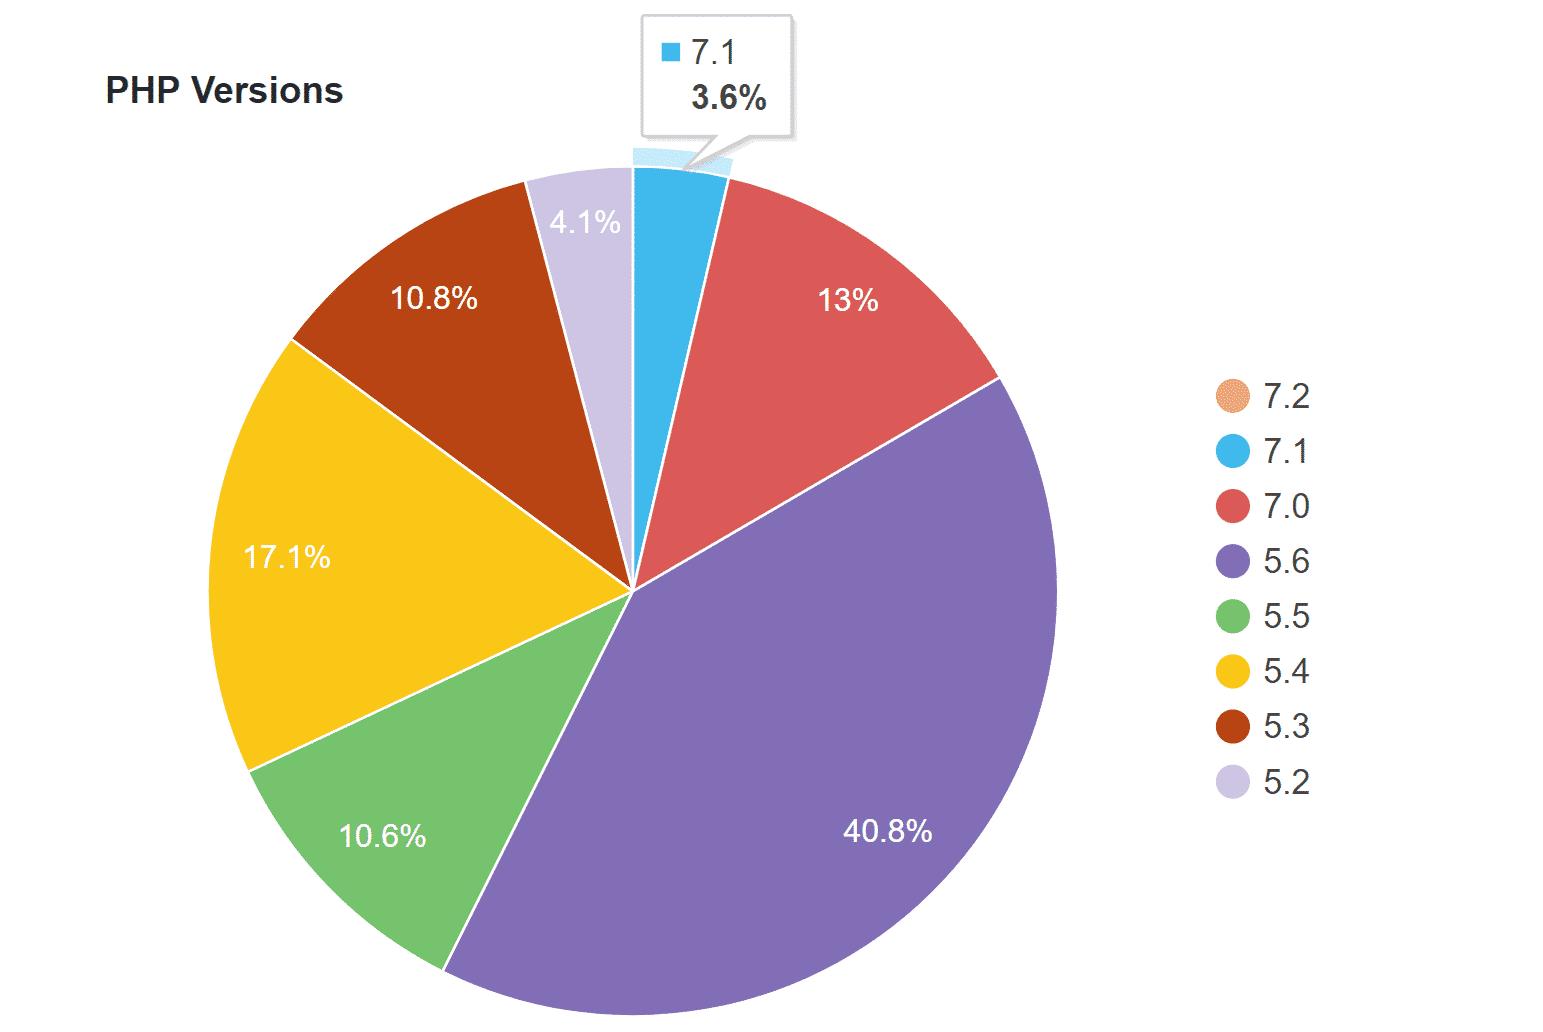 WordPress PHP 7.1 stats